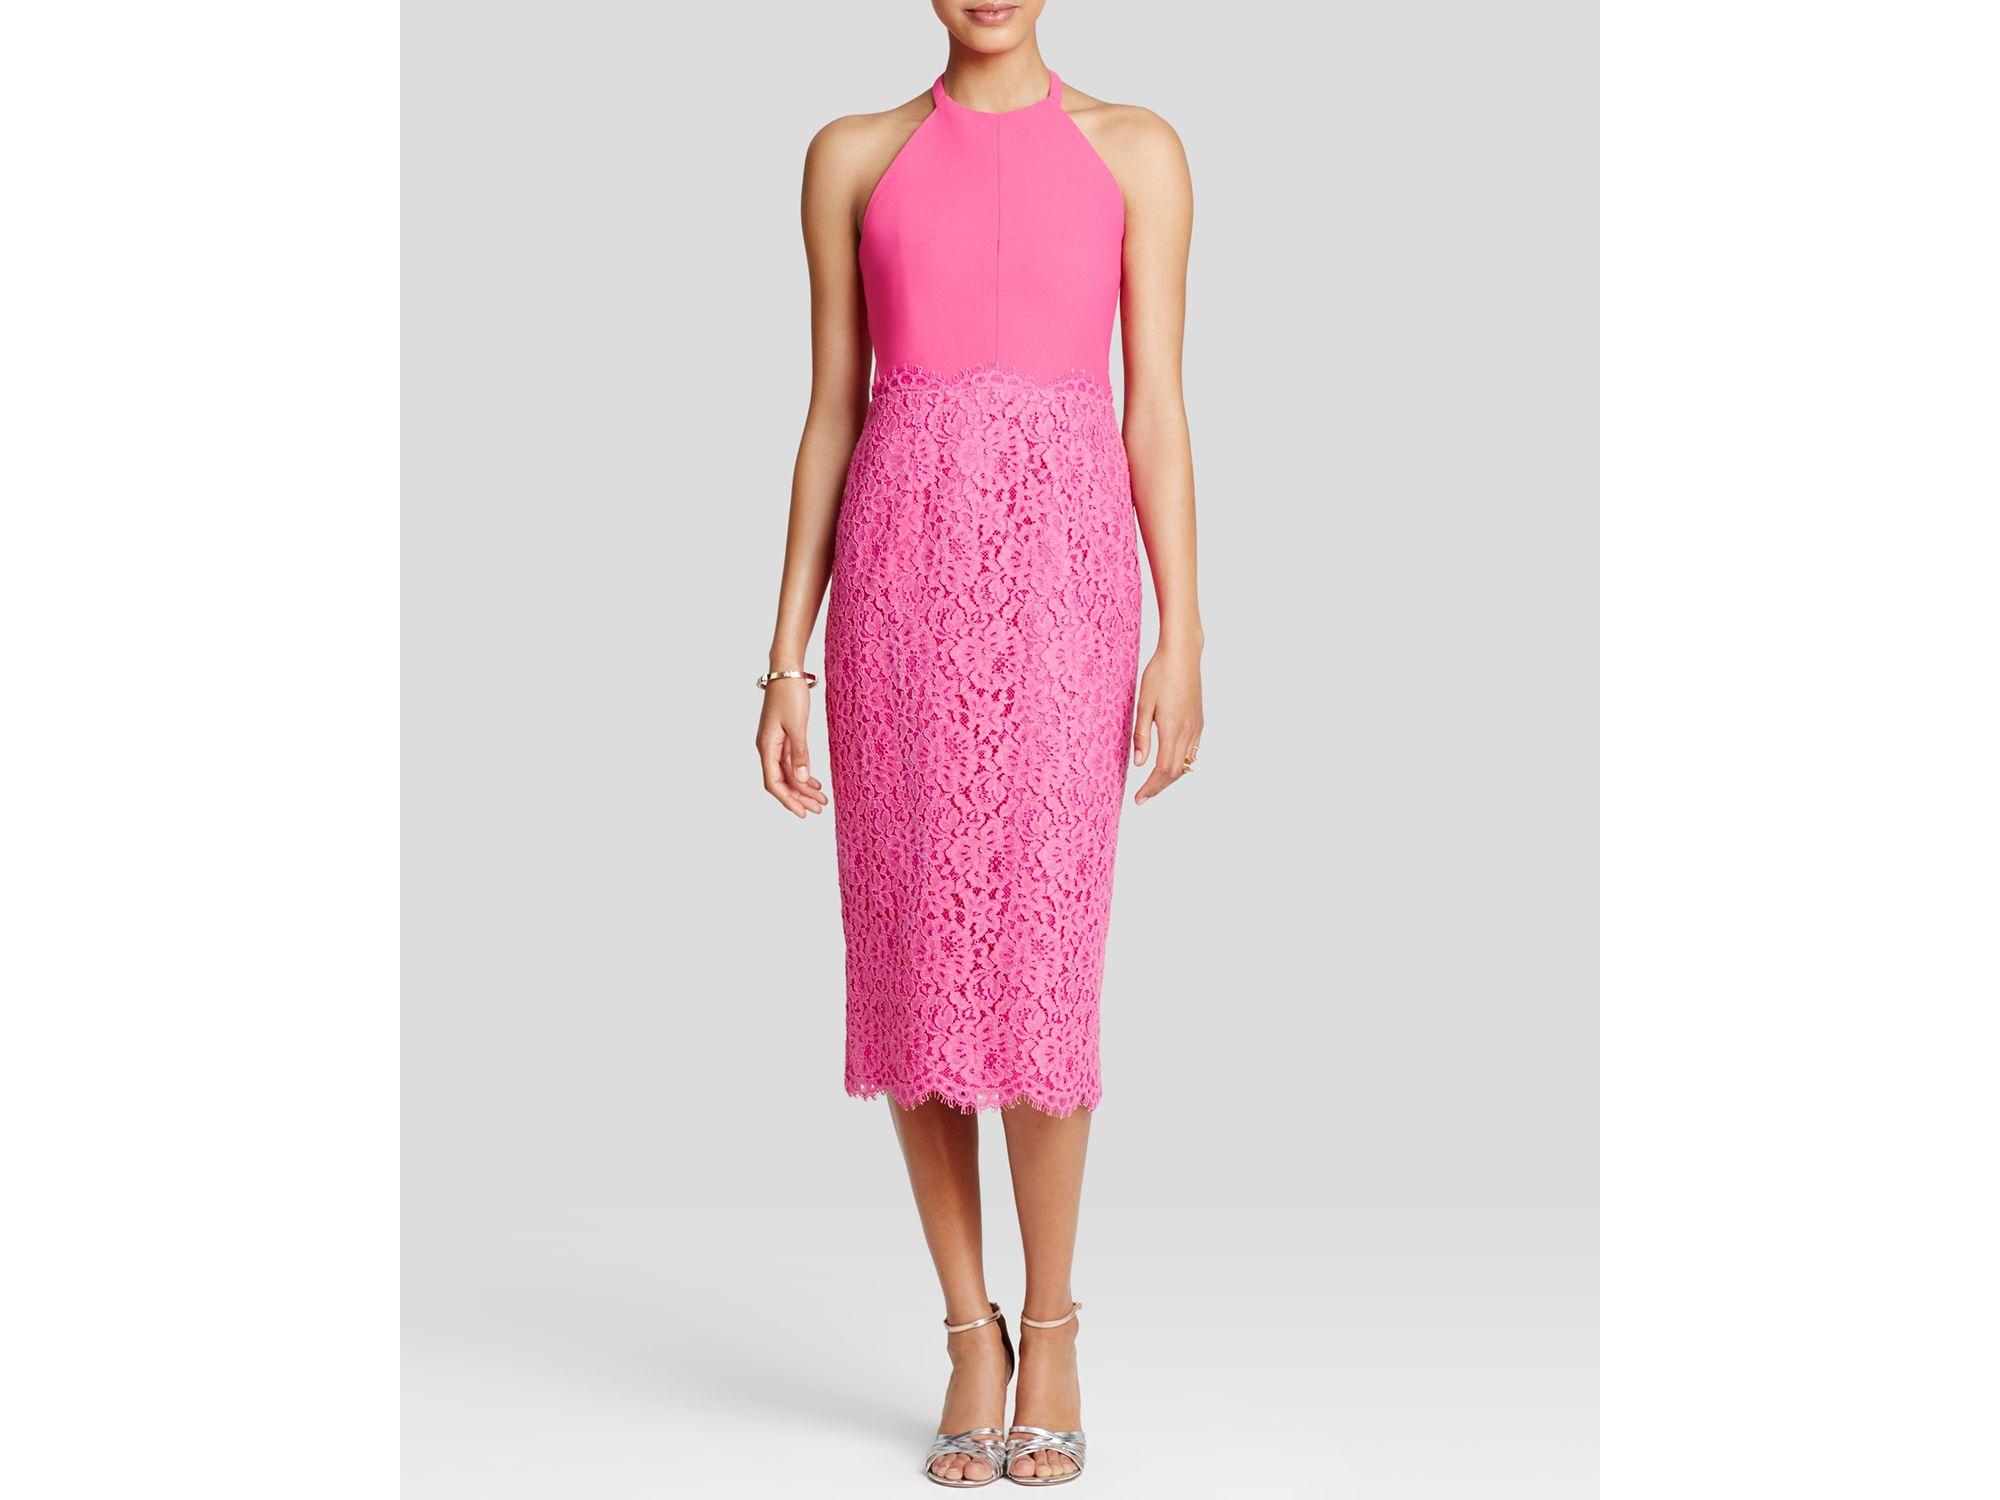 Shoshanna Dress - Uma Lace Midi in Pink   Lyst